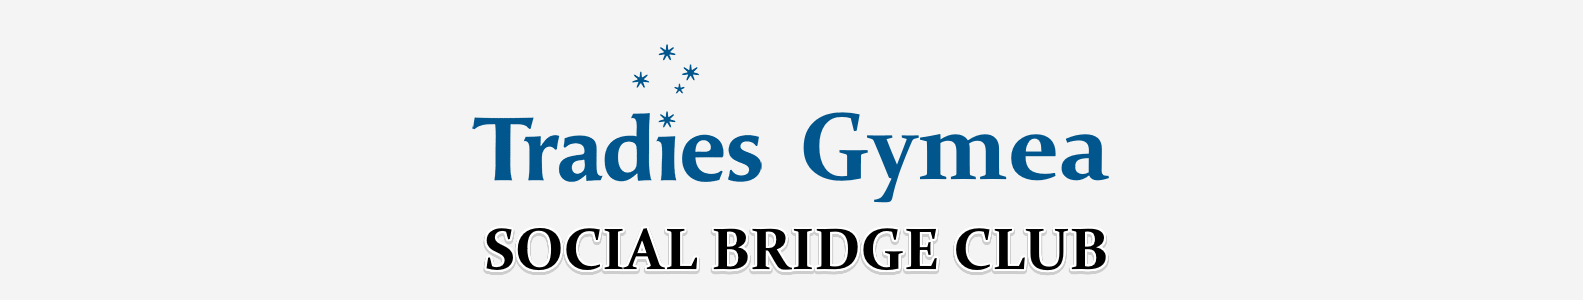 How to Enter Tradies Gymea Social Bridge Club Pairs Games